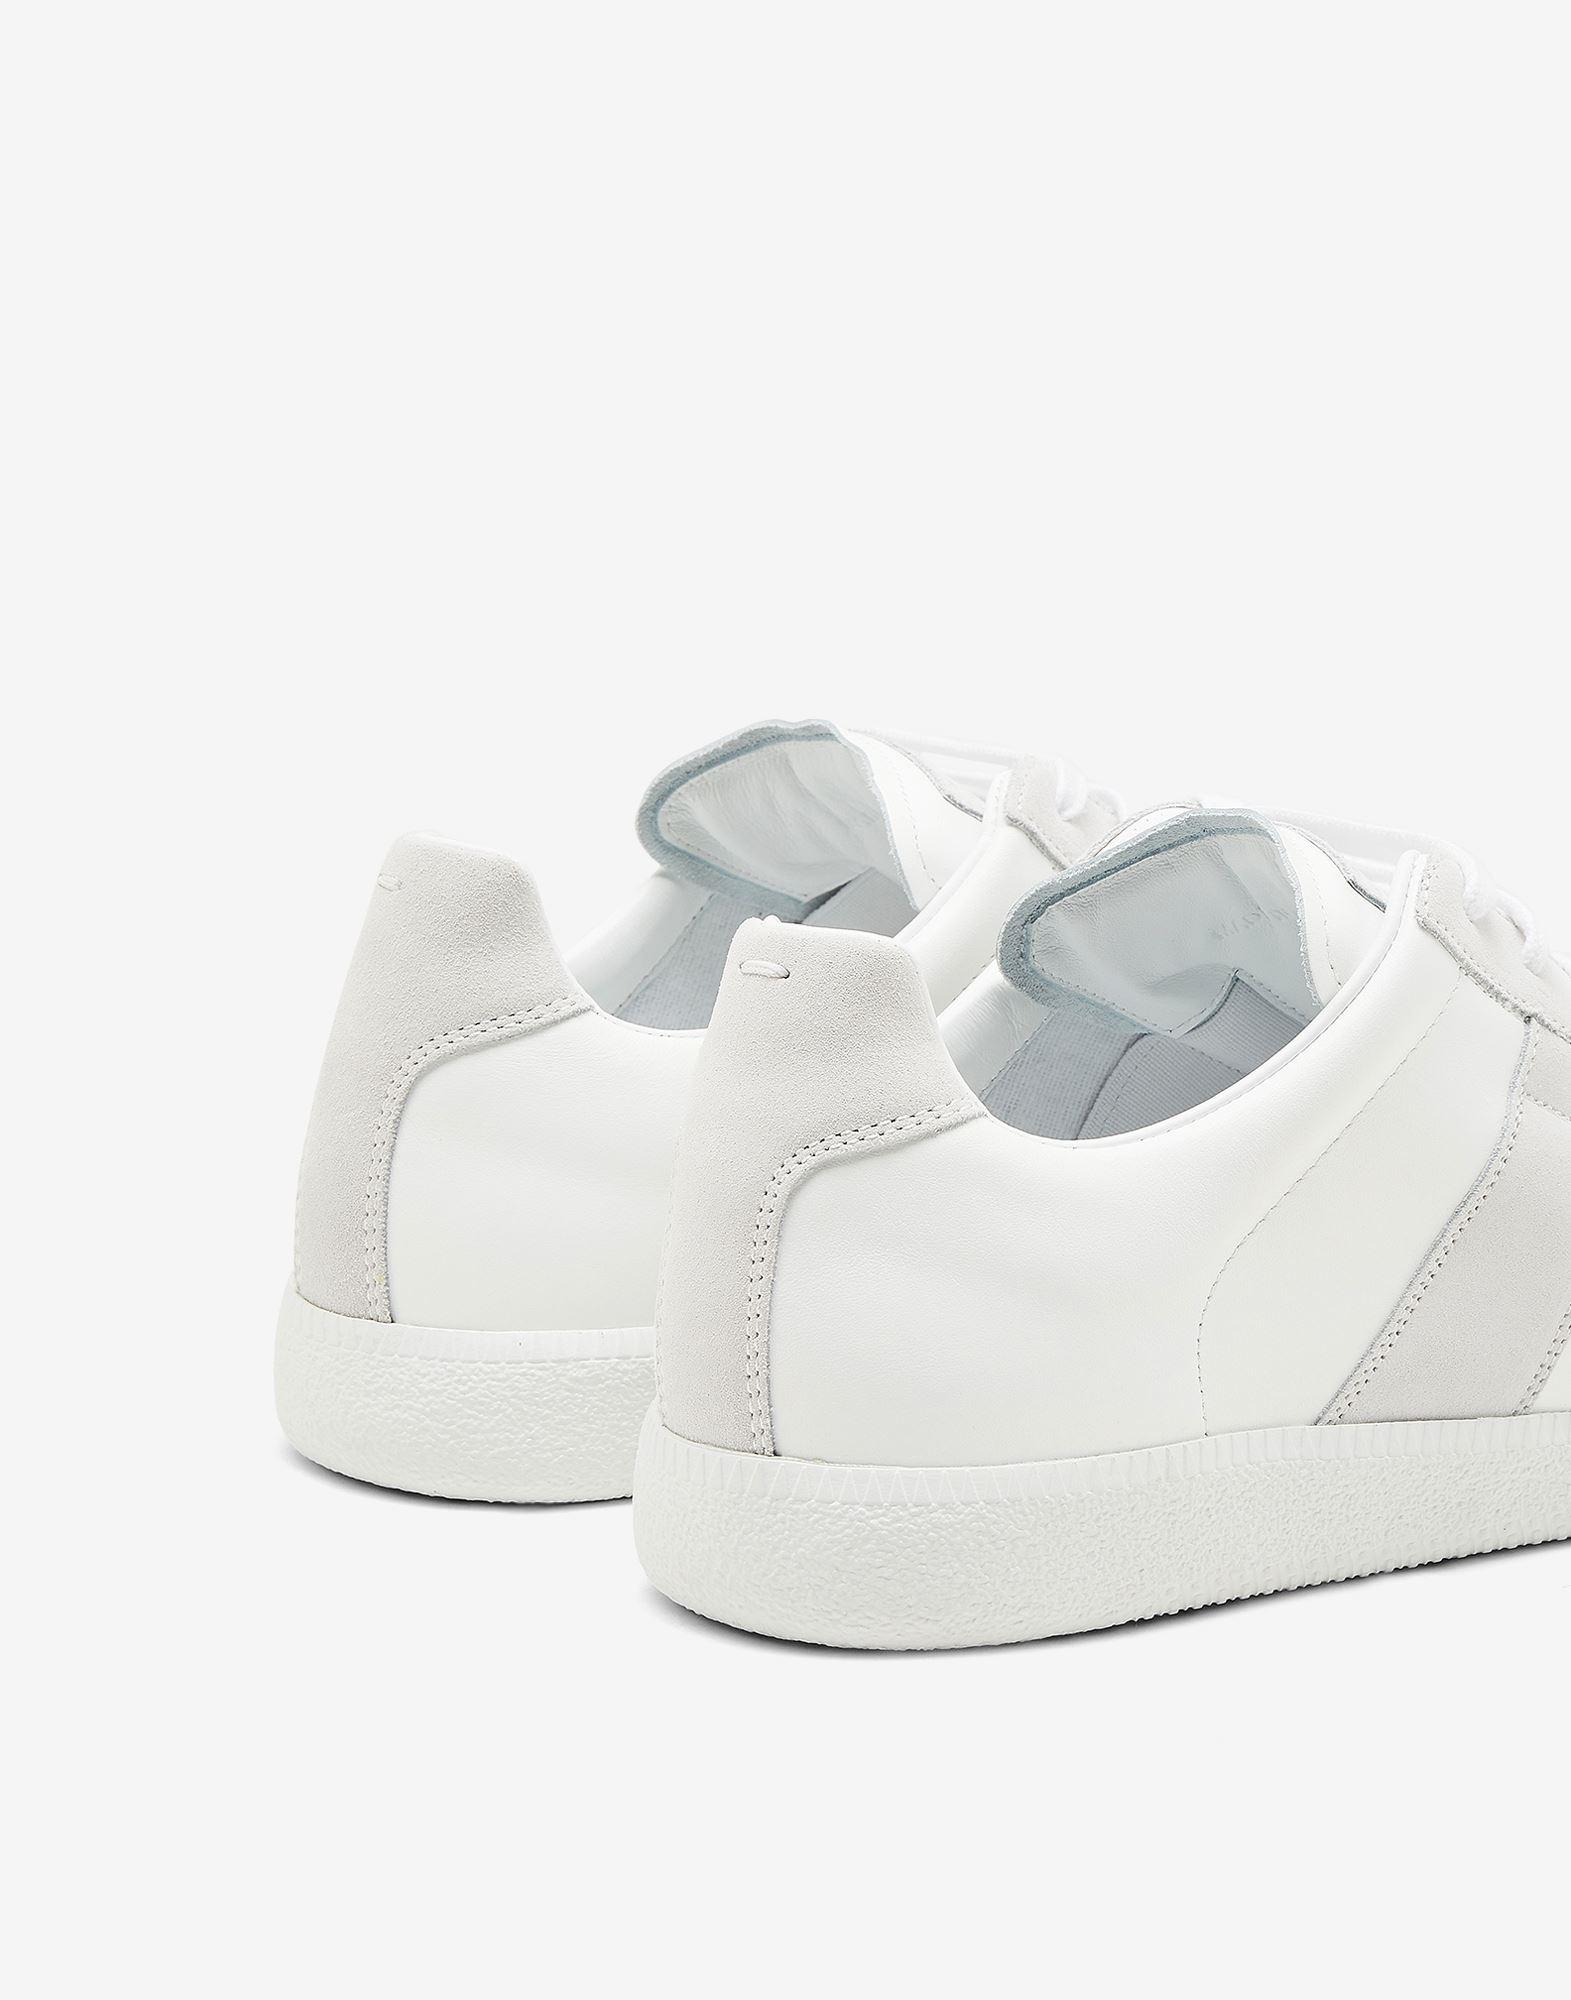 MAISON MARGIELA Calfskin 'Replica' sneaker Sneakers Man e